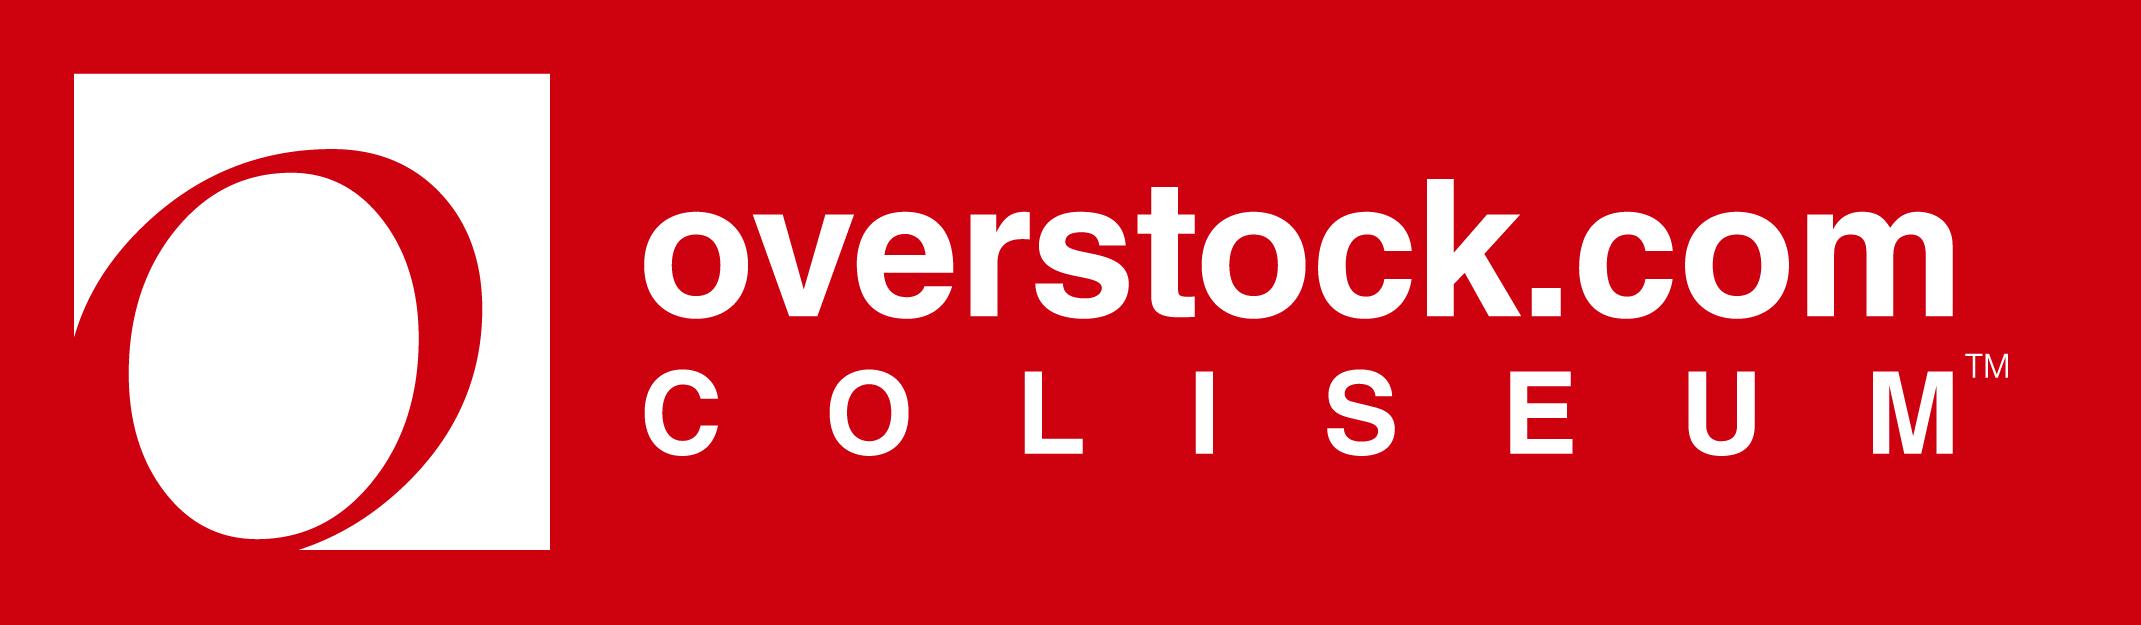 Overstock.com coupon code 20